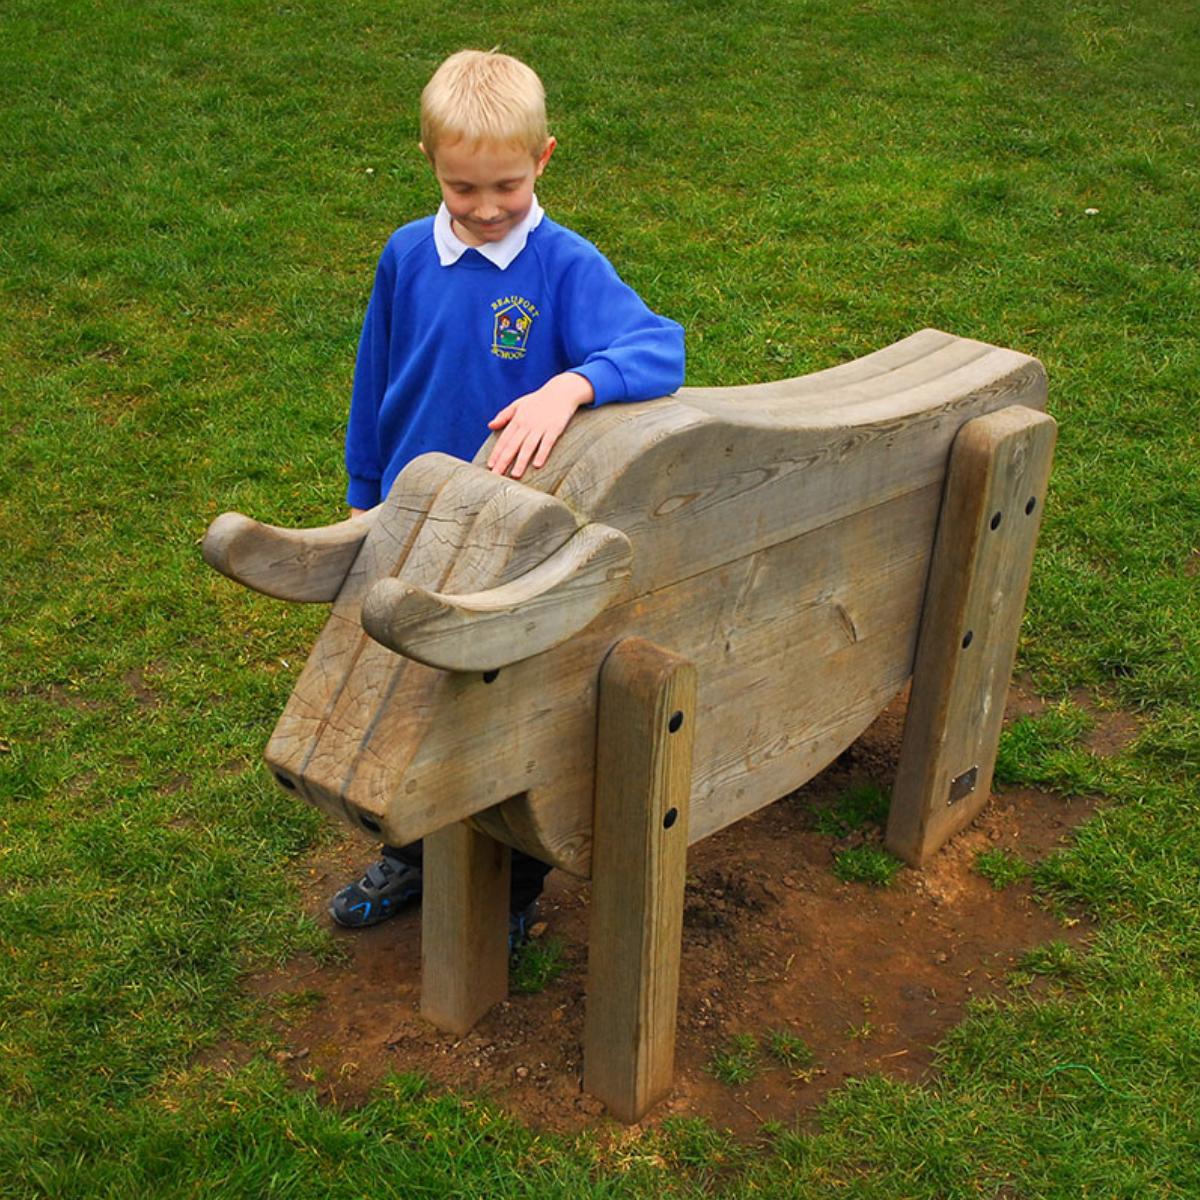 Raging Bull Play Sculpture